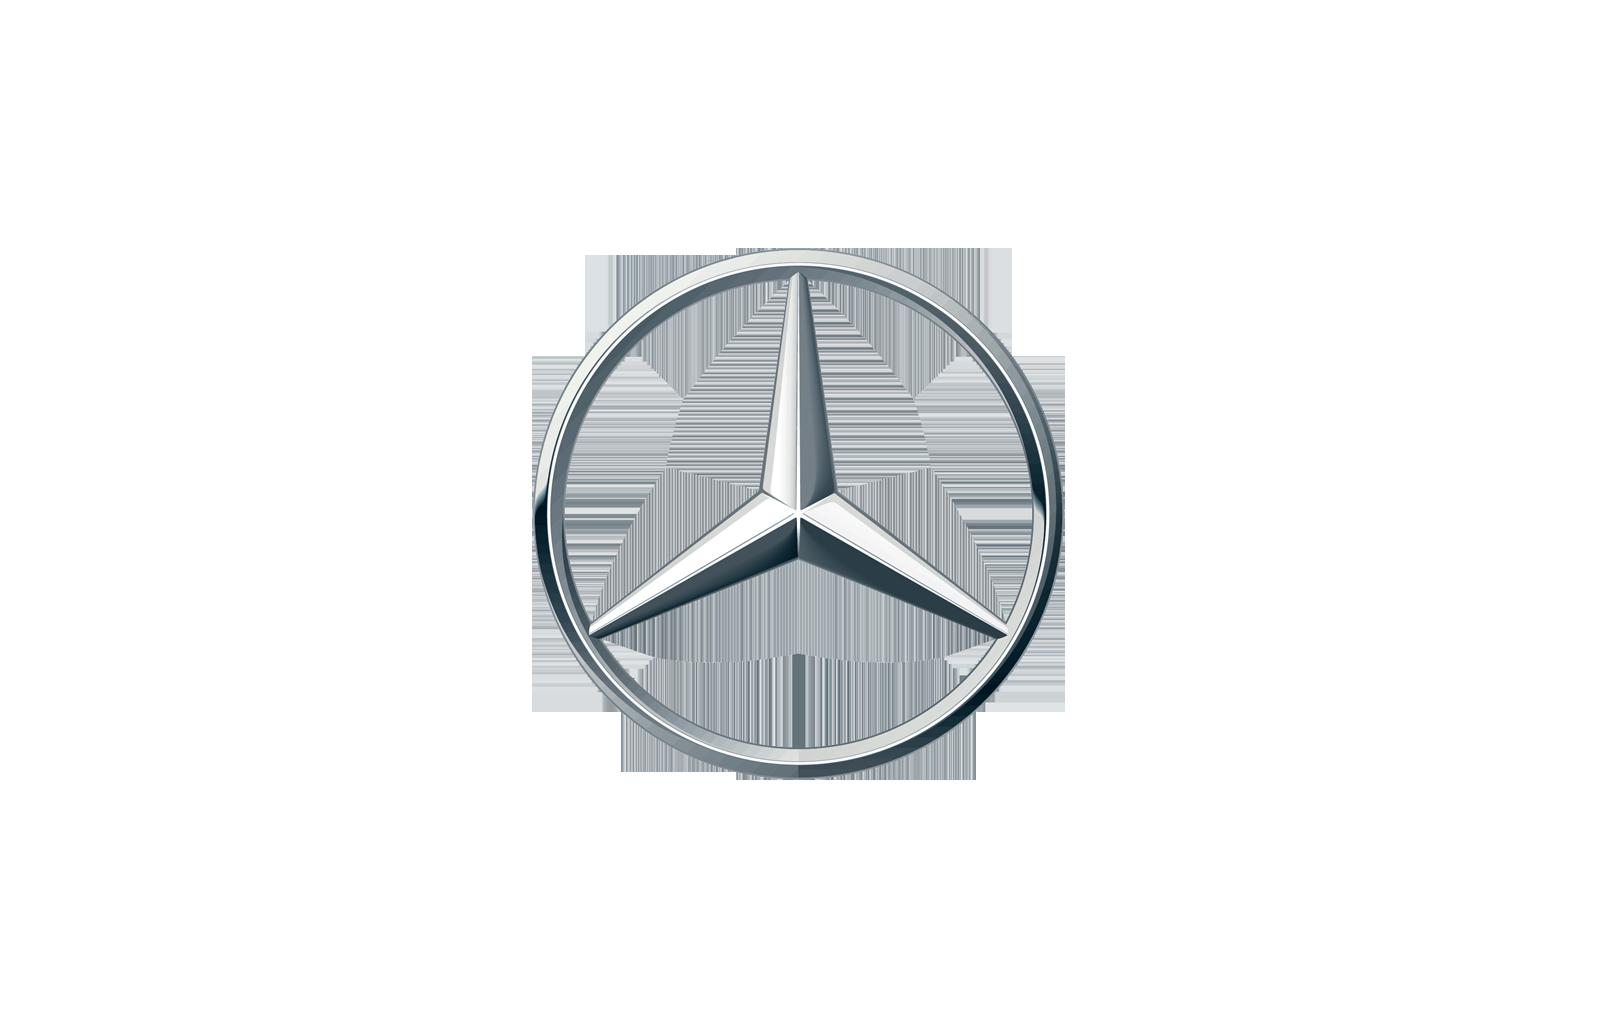 image logo mercedes